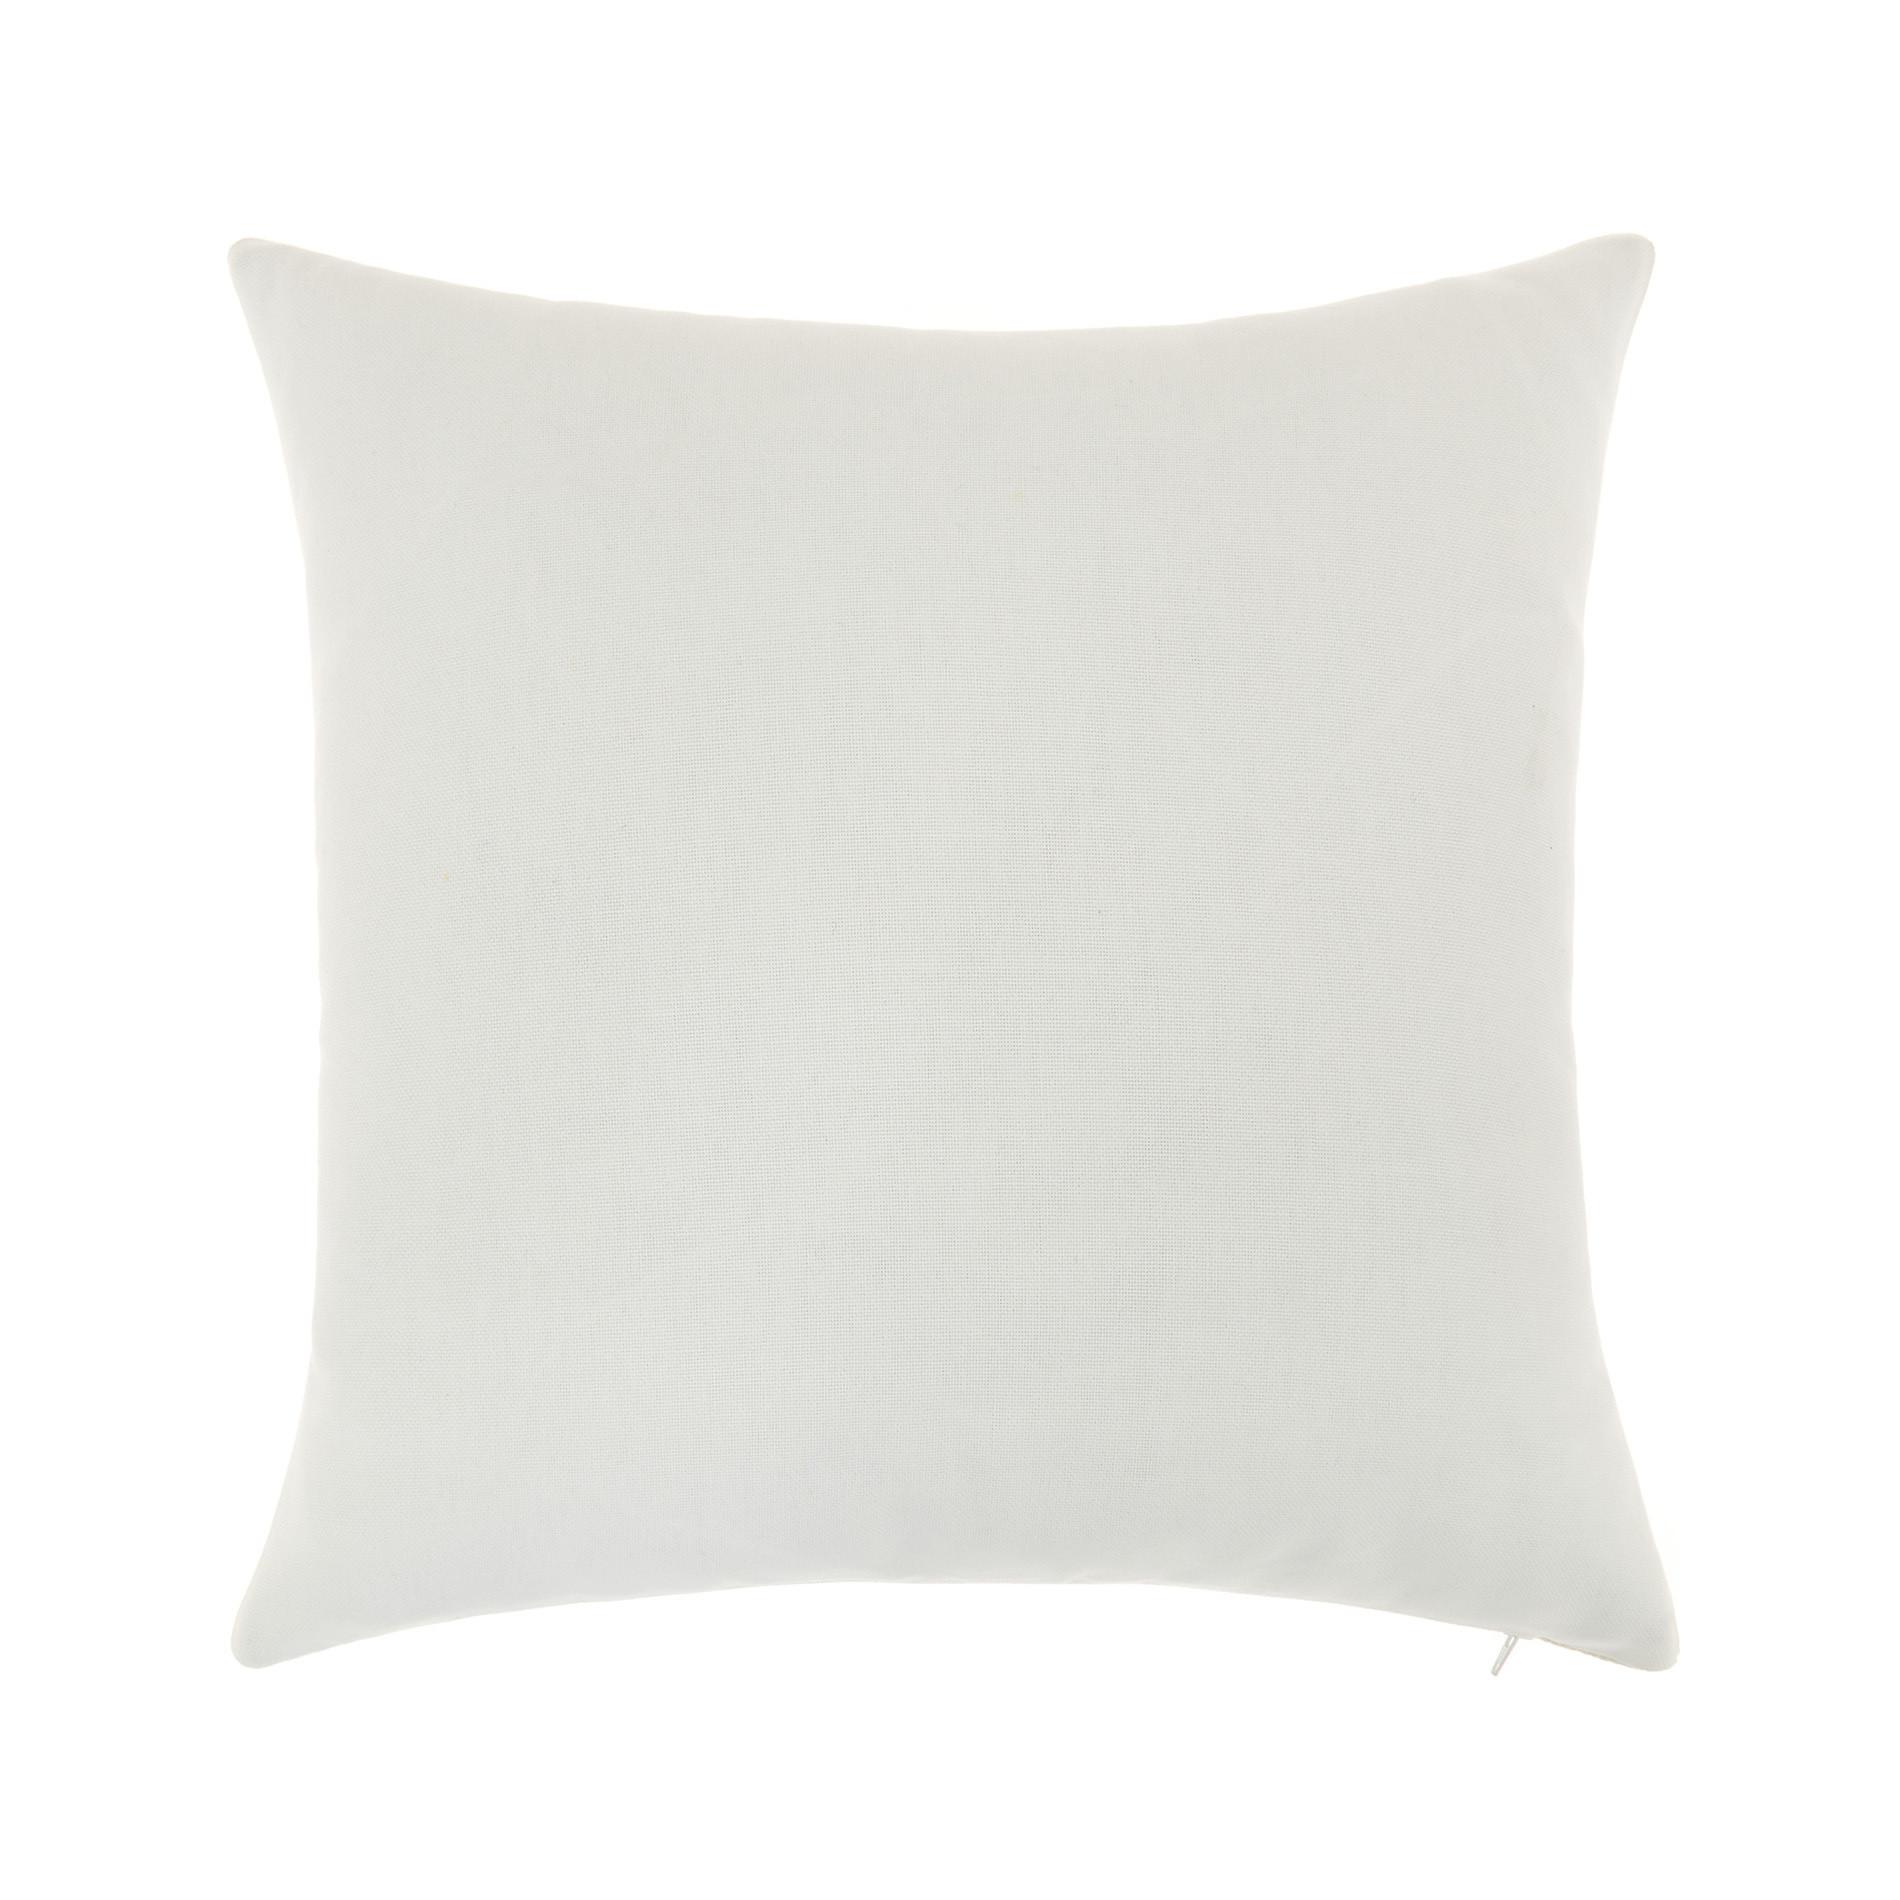 Cuscino jacquard motivo geometrico 43x43cm, Bianco, large image number 1